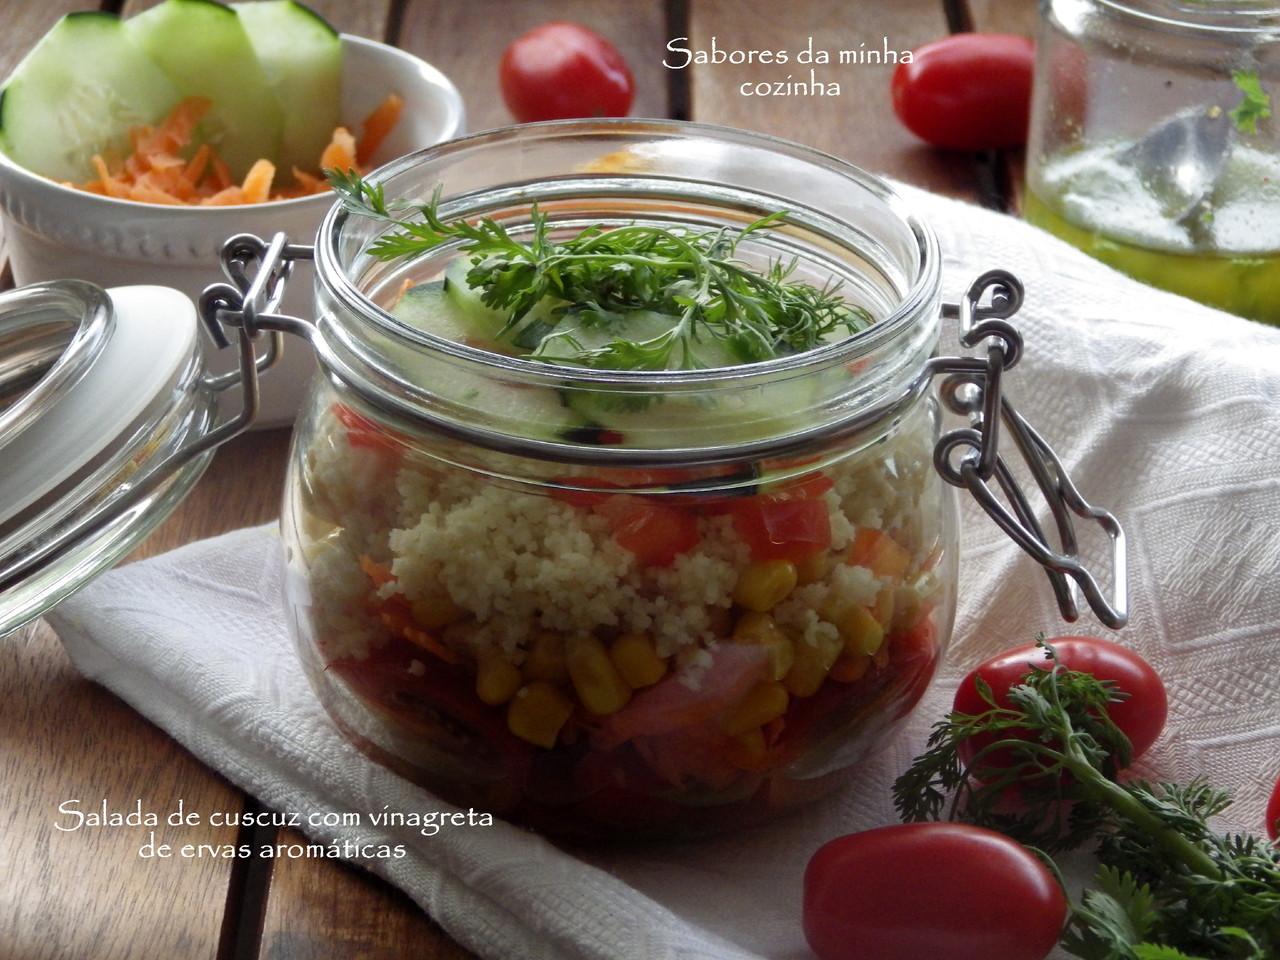 IMGP4900-Salada de cuscuz-Blog.JPG